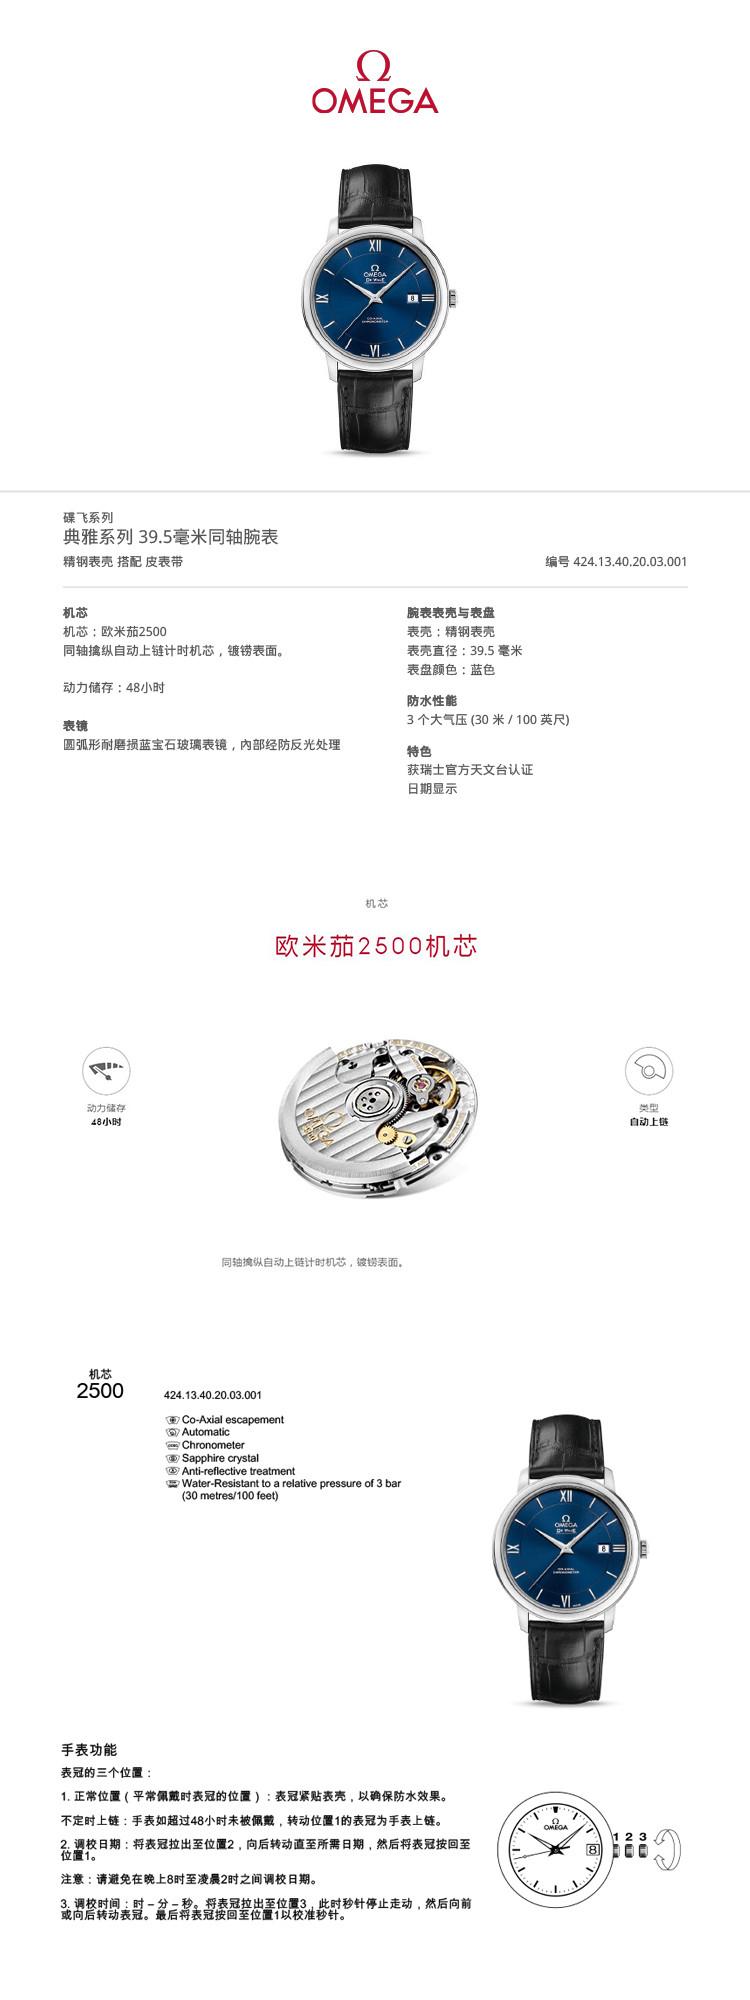 OMEGA/欧米茄 碟飞系列 自动机械男士腕表 424.13.40.20.03.001